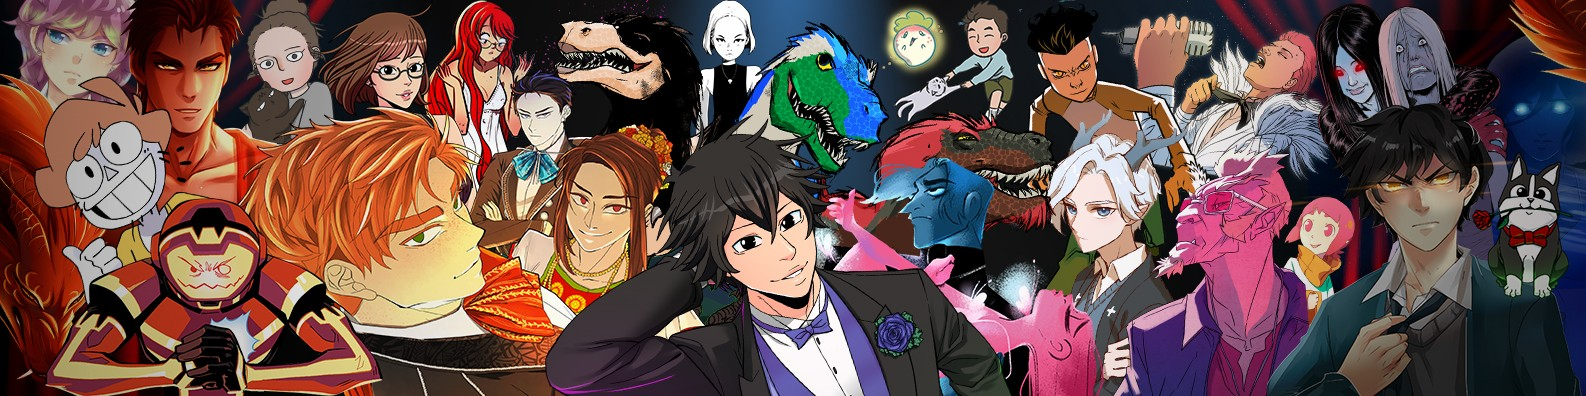 Webtoon Entertainment Inc    LinkedIn